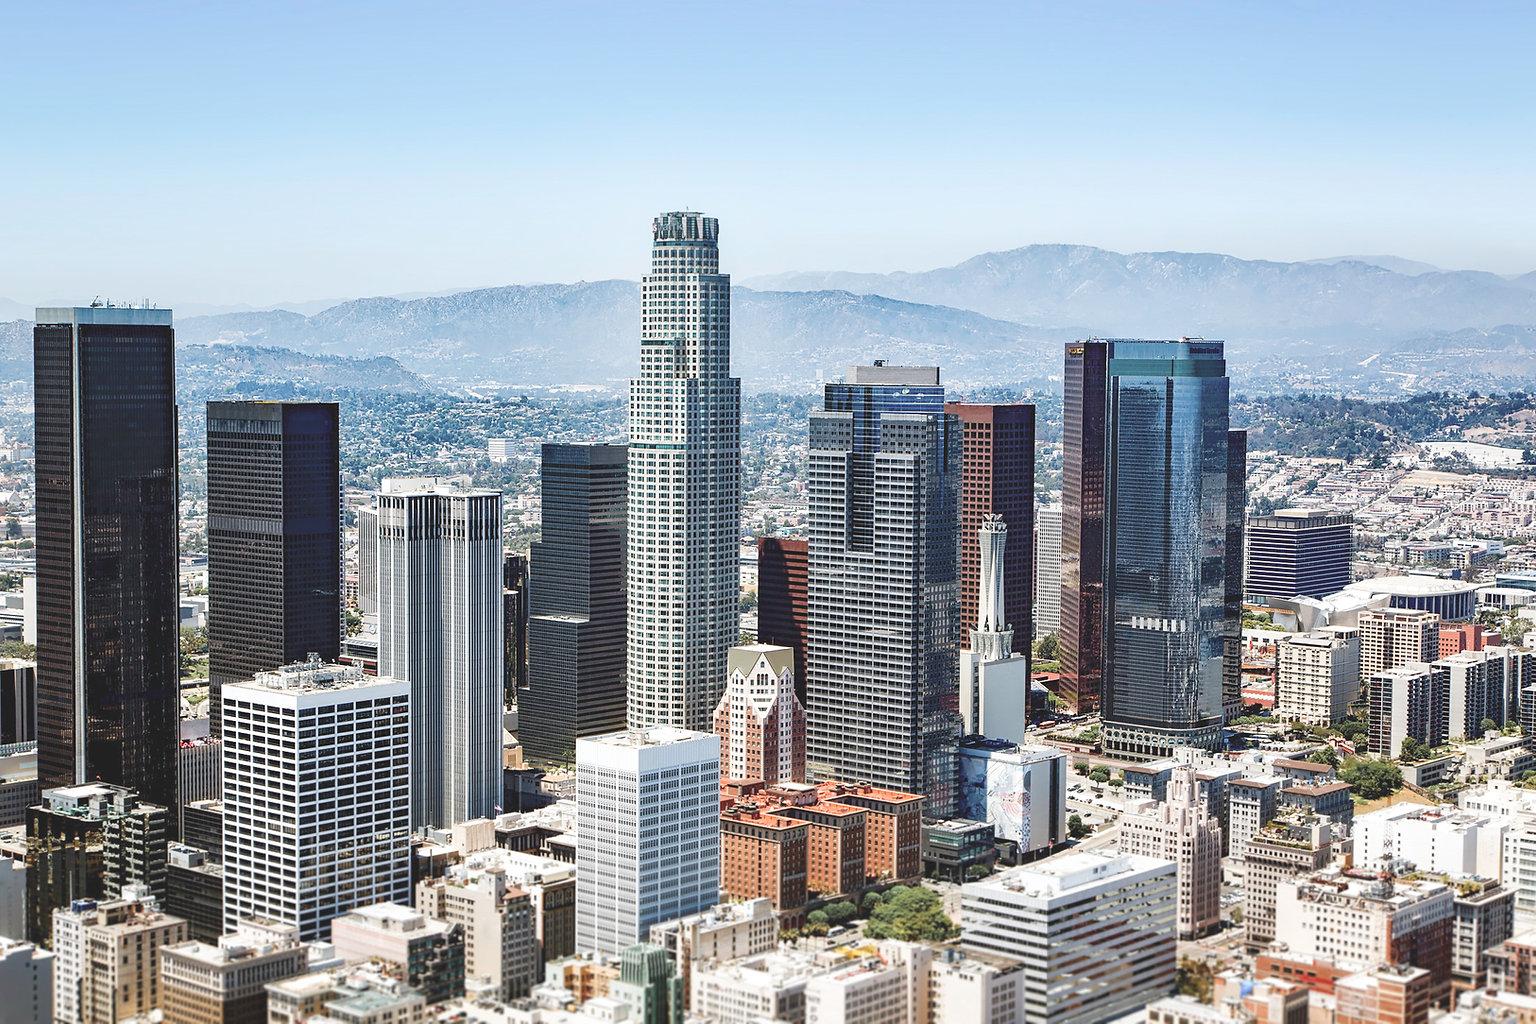 Los Angeles city birds eye view